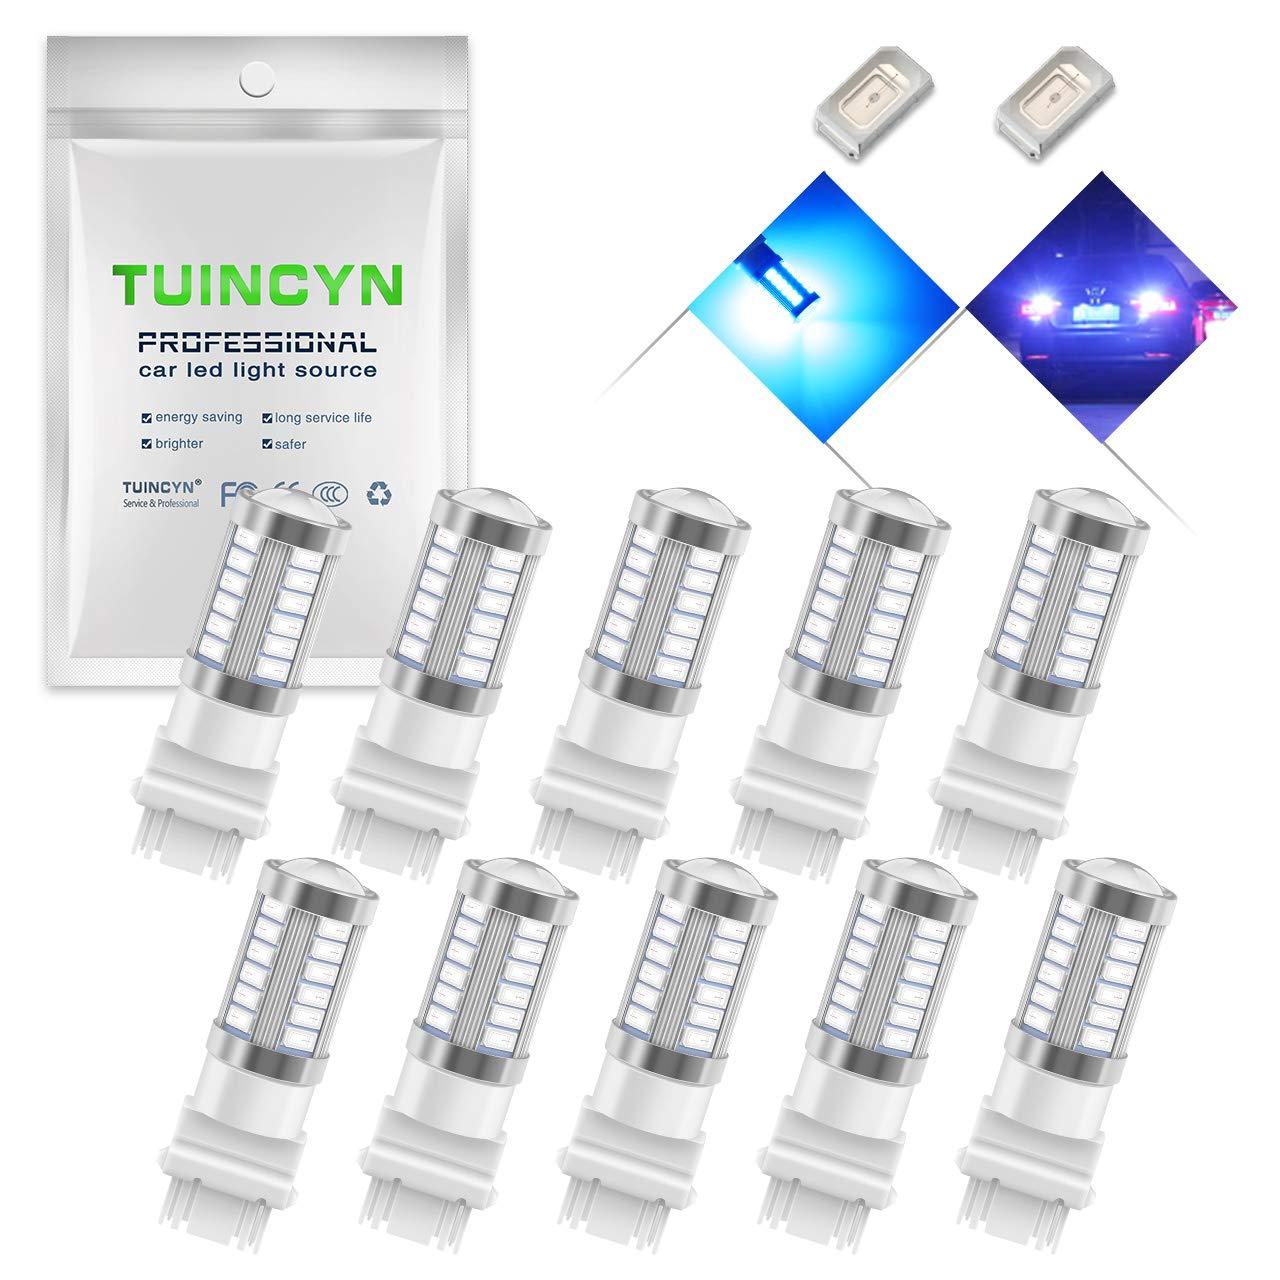 TUINCYN 3157 3155 3156 3157A 3457A LED Brake Light Bulb Blue 5630 33SMD 900 Lumens Super Bright Tail Light Back Up Reverse Light Parking Light Turn Signal Light DC 12V Pack of 4